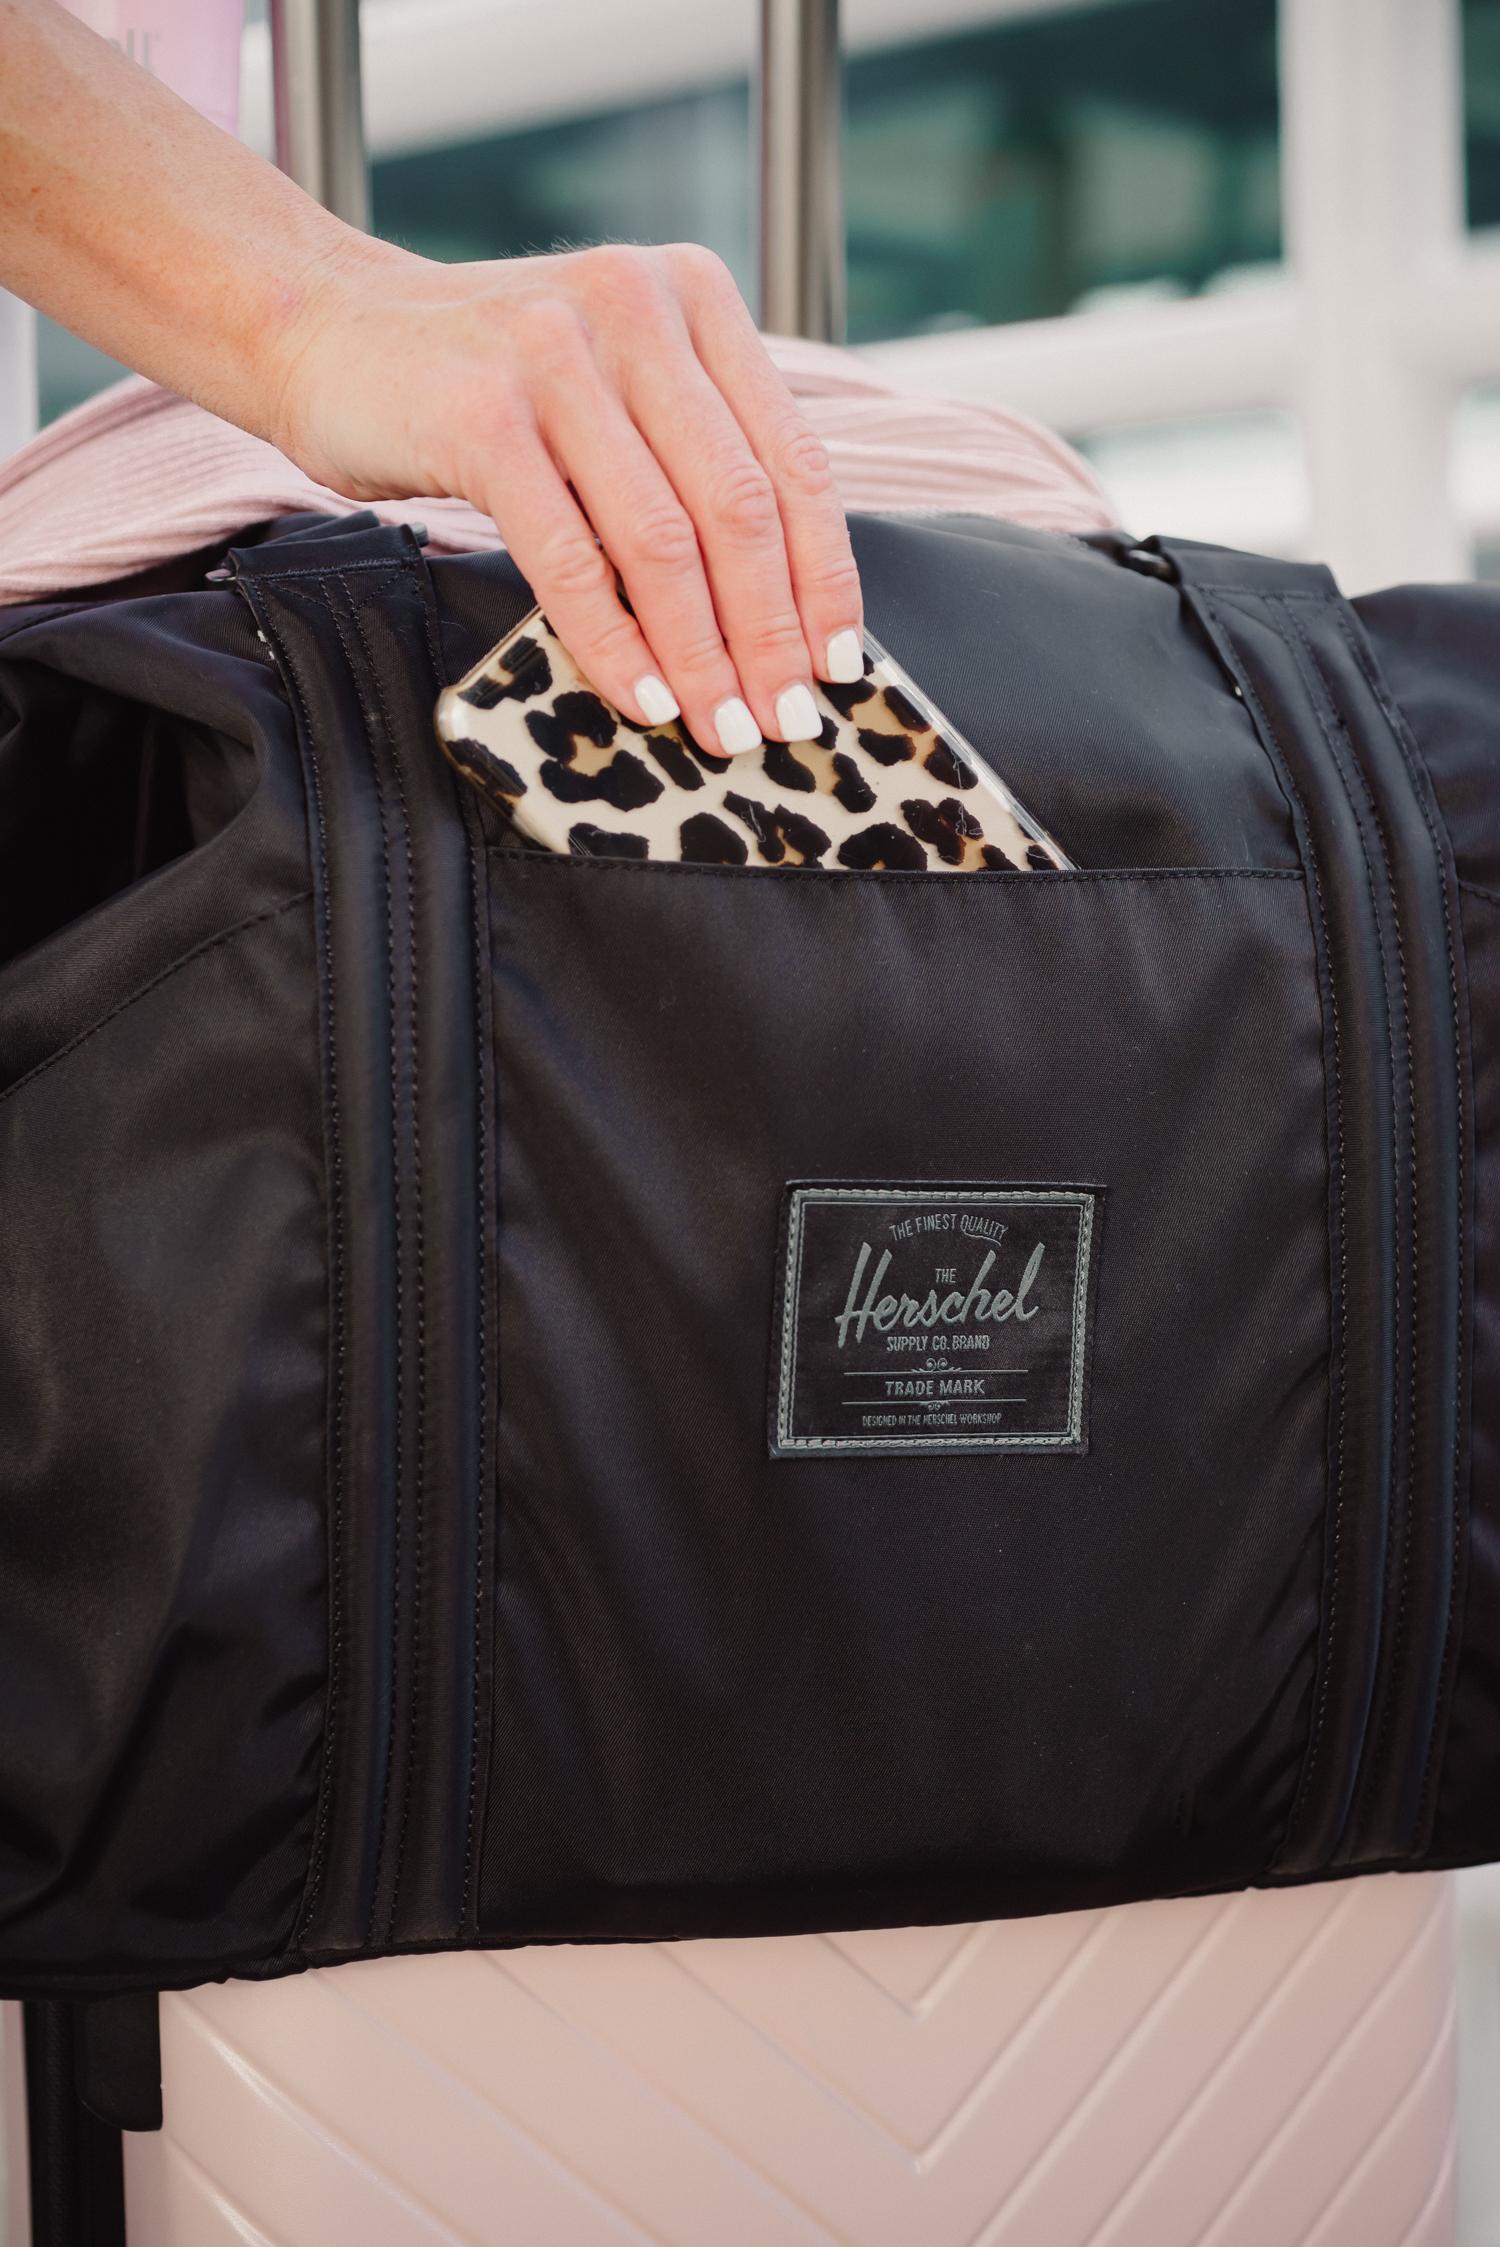 nordstrom anniversary sale travel herschel bag